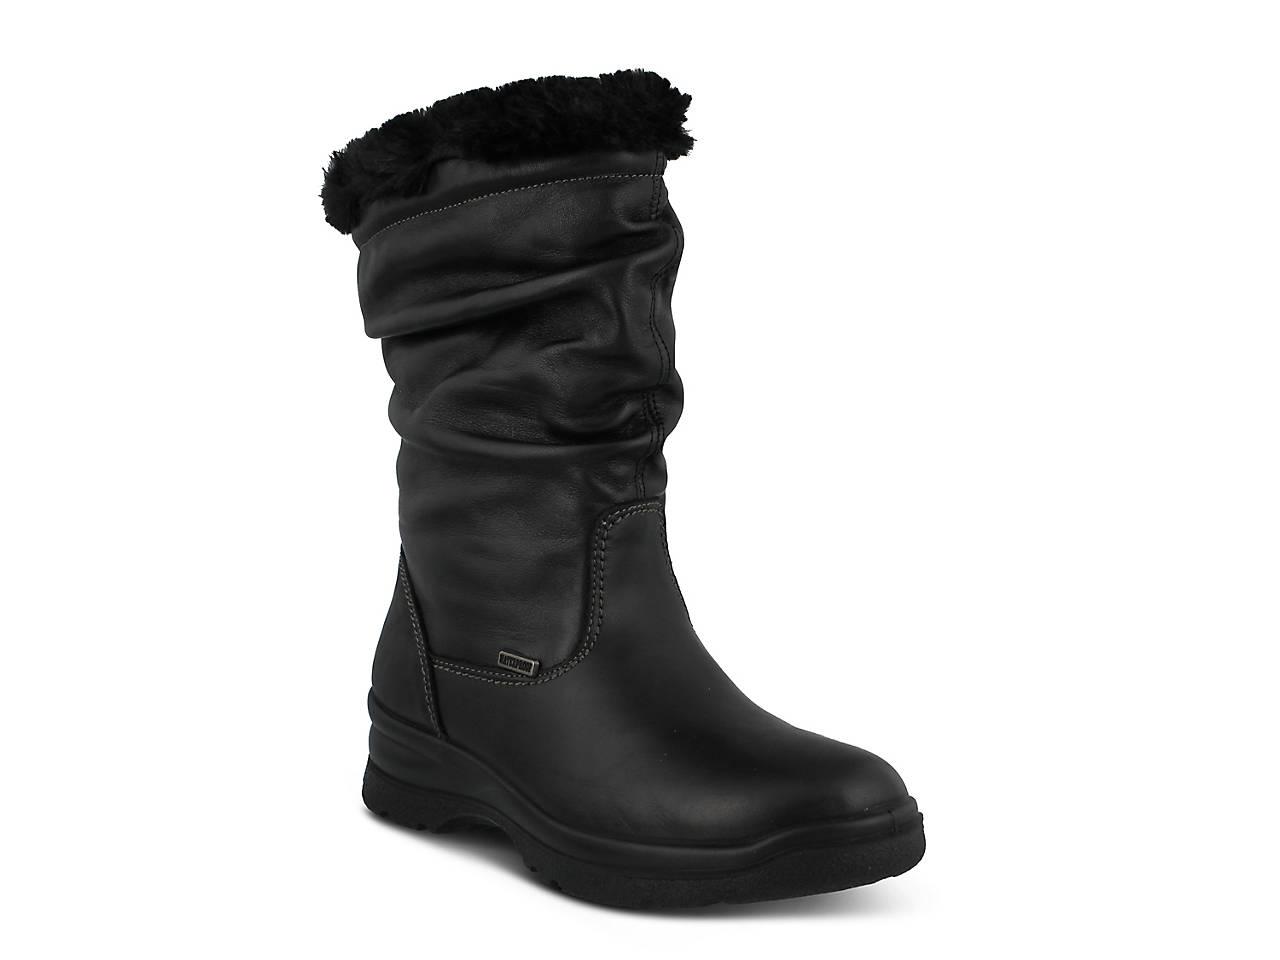 cc052e1c1edf Flexus by Spring Step Shorepei Boot Women s Shoes